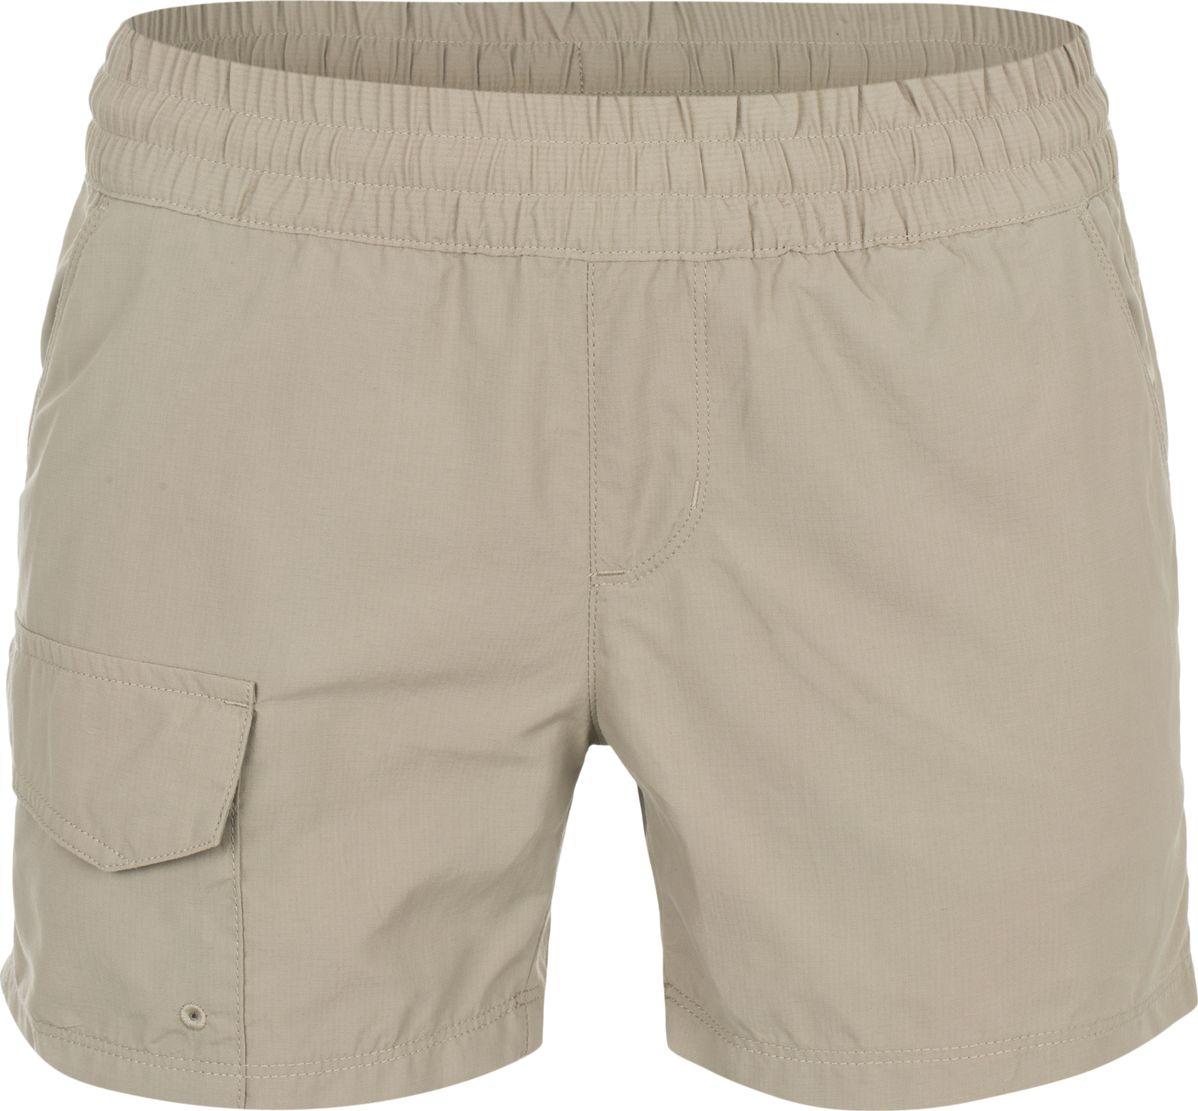 Шорты женские Columbia Silver Ridge Pull On Short W Shorts, цвет: бежевый. 1710641-221. Размер XS (42) deluxe acupuncture model 178cm acupuncture model